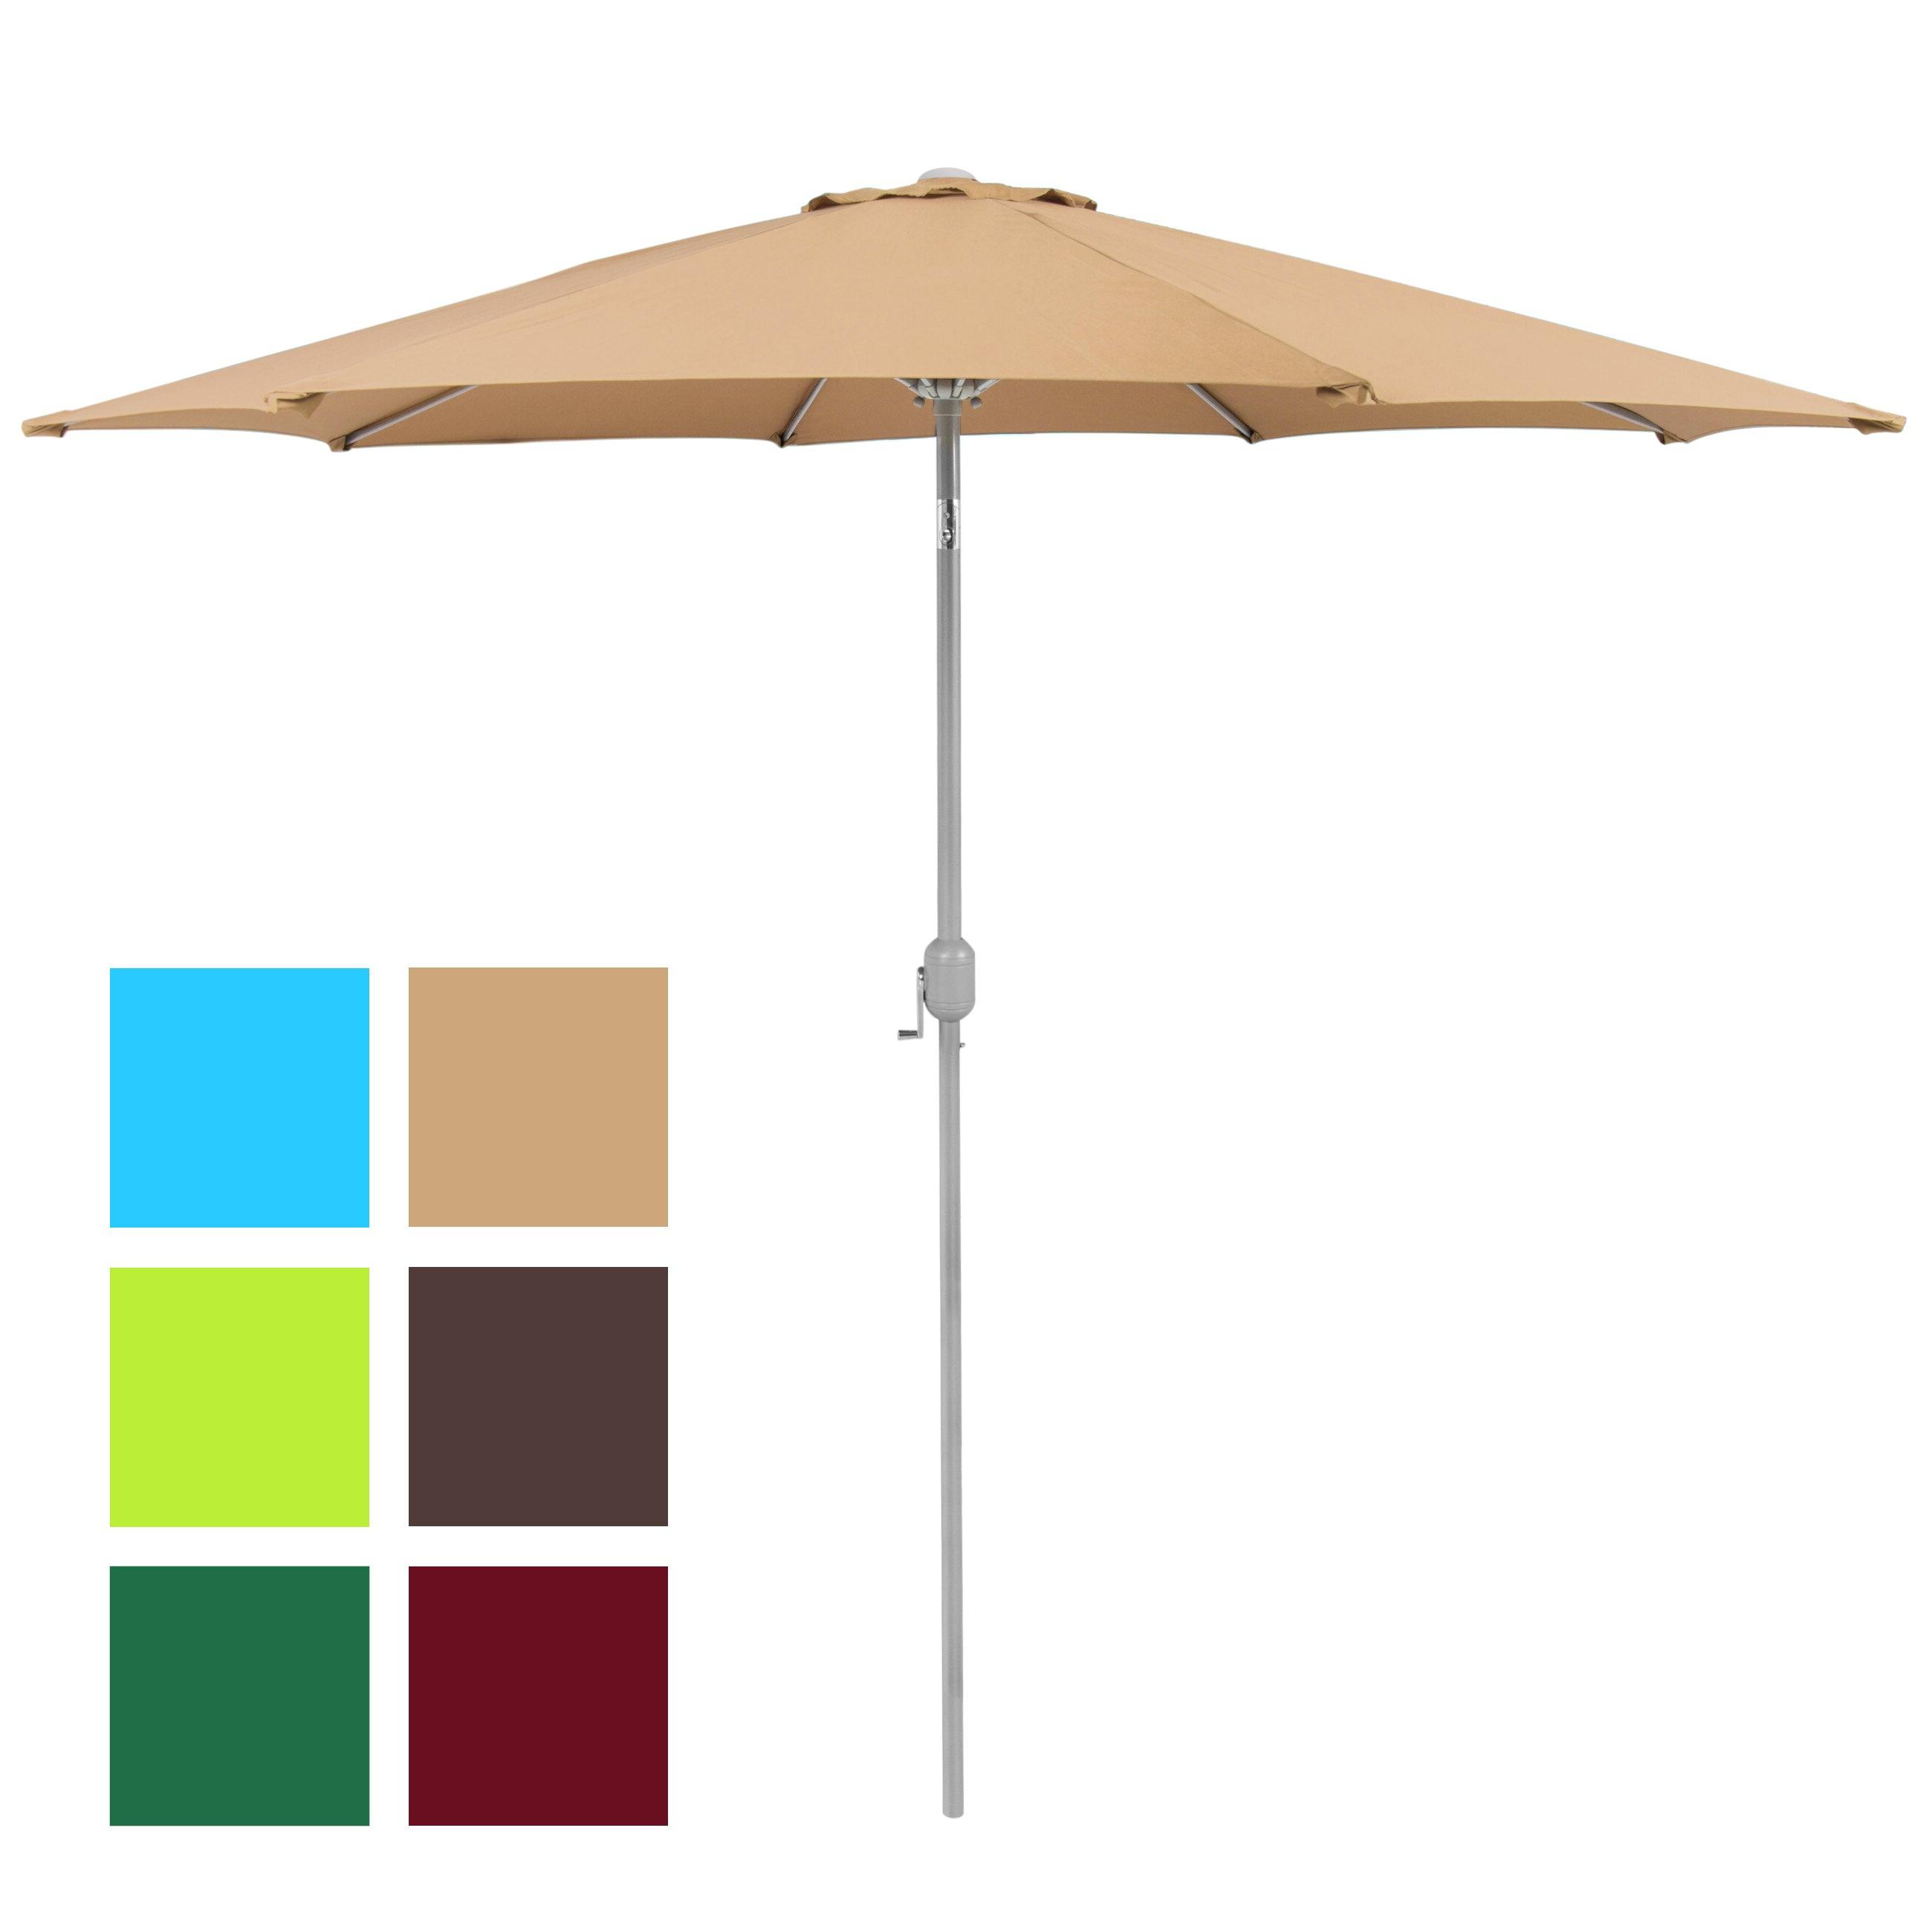 Patio Umbrella 9' Aluminum Patio Market Umbrella Tilt W/ Crank Outdoor Tan Intended For Best And Newest Market Umbrellas (View 8 of 20)